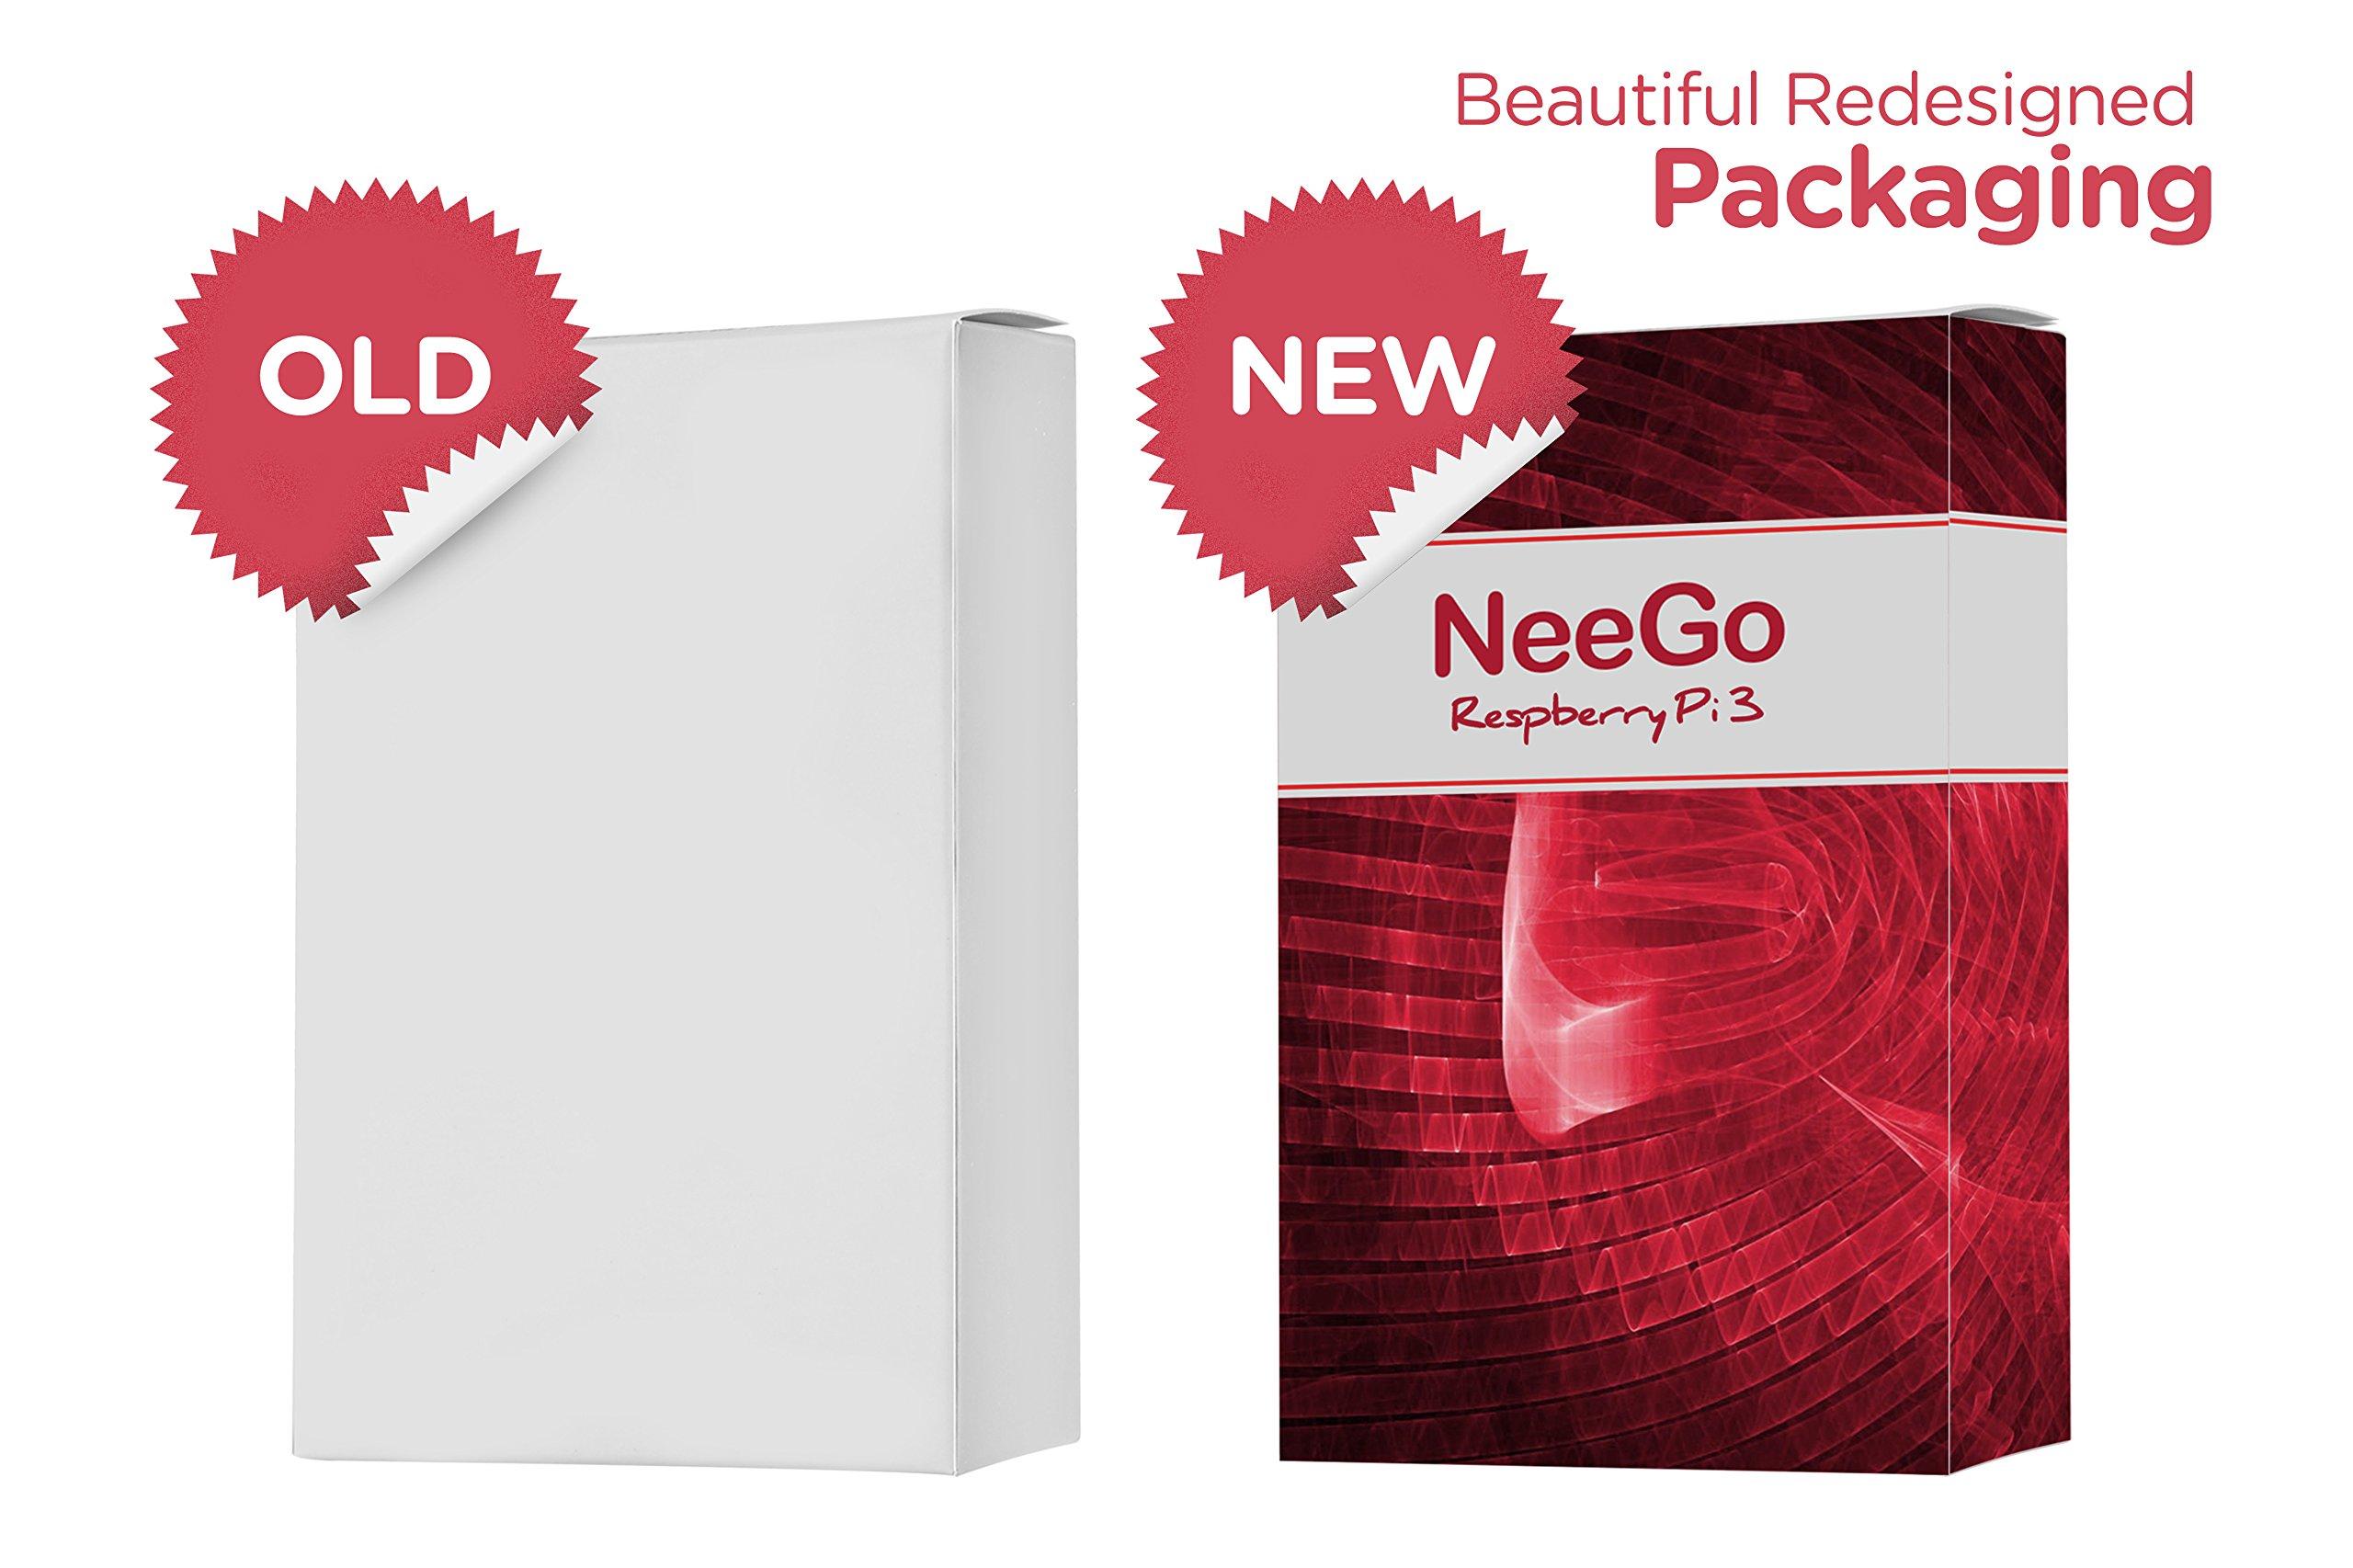 NeeGo Raspberry Pi 3 Starter Kit – Pi 3 Model B Barebones Computer Motherboard with 64bit Quad Core CPU & 1GB RAM, 2.5A Power Supply & Heatsink 2-Pack by NeeGo (Image #5)